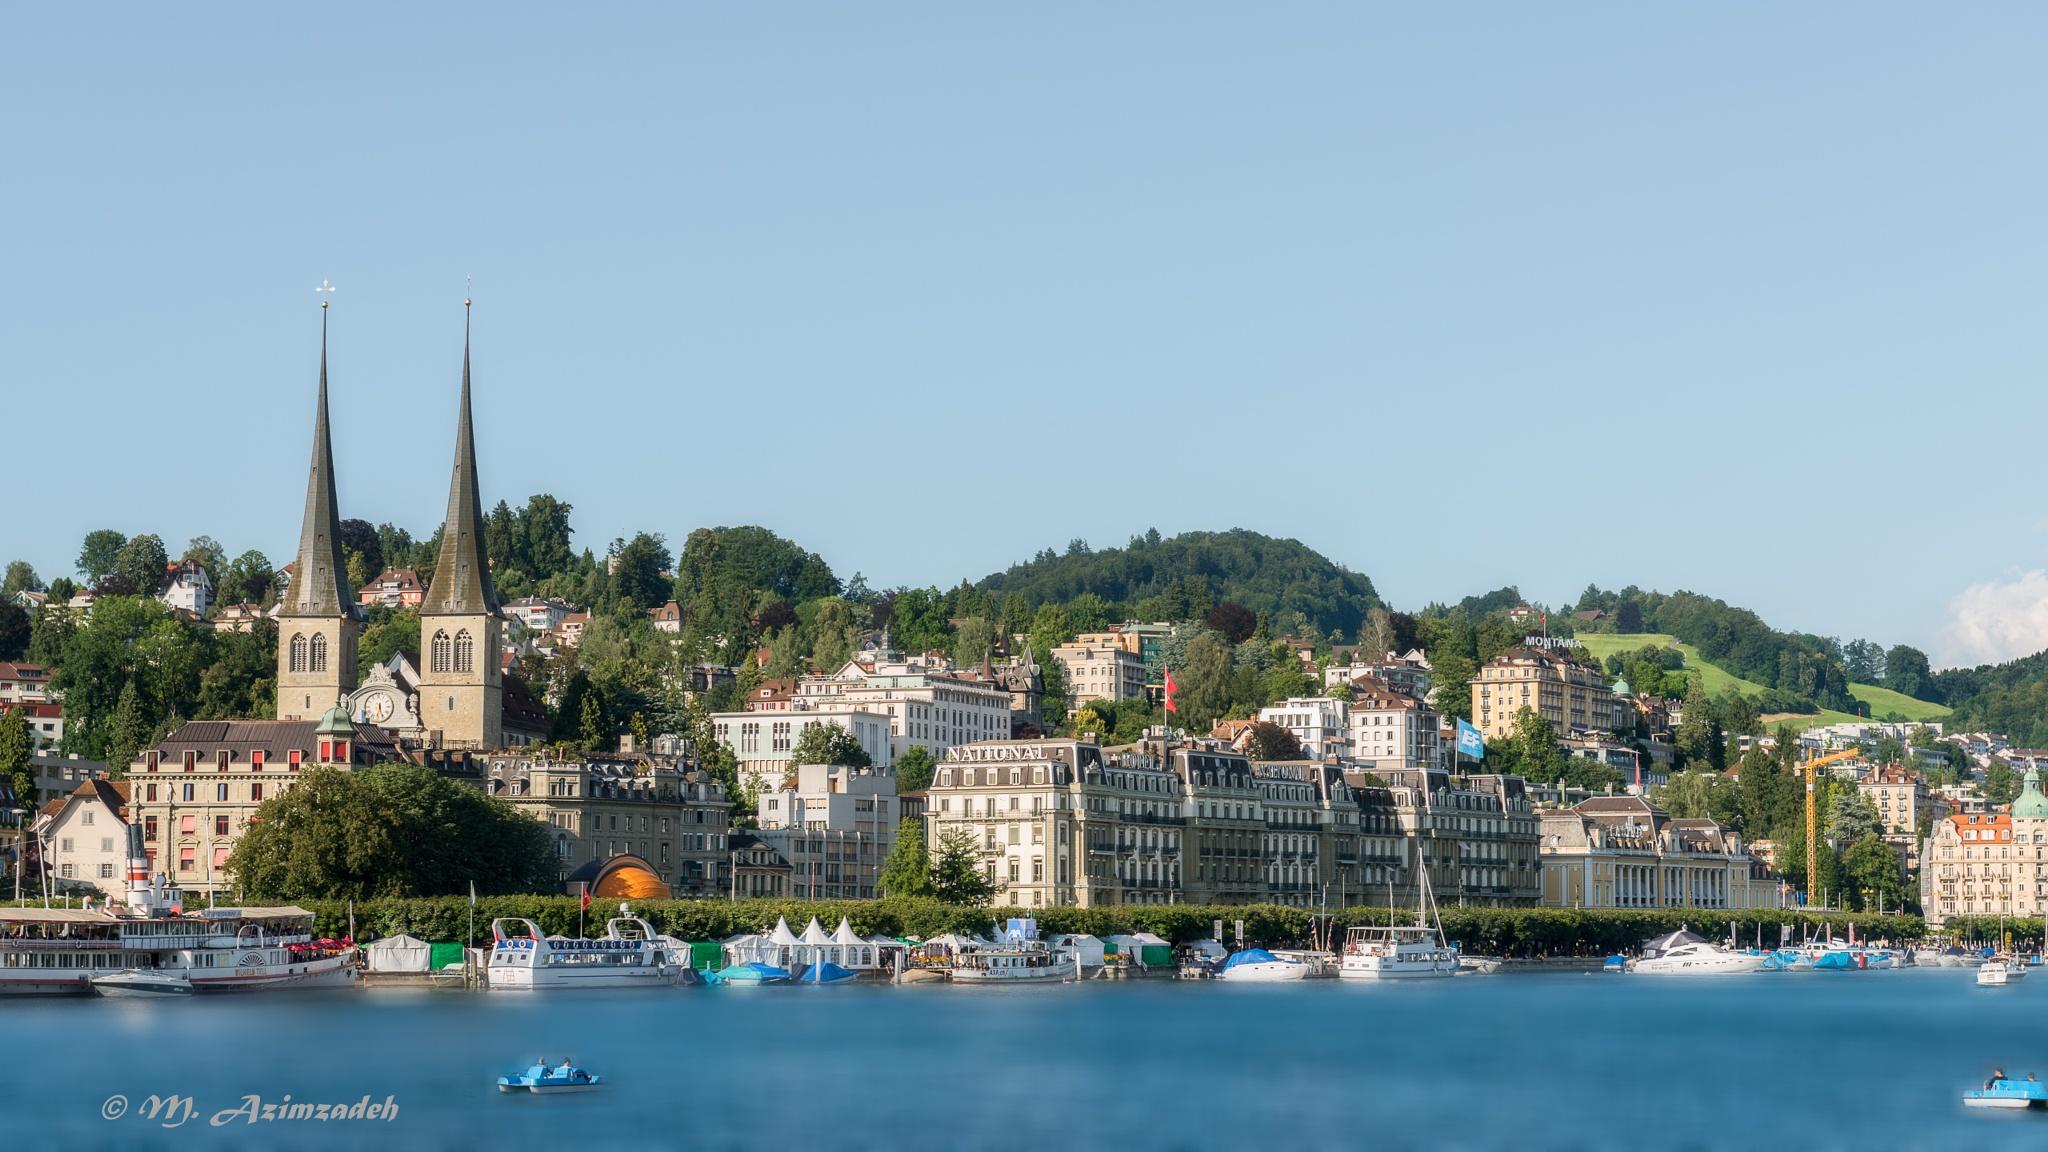 City Luzern in Switzerland by Mohammed Azimzadeh